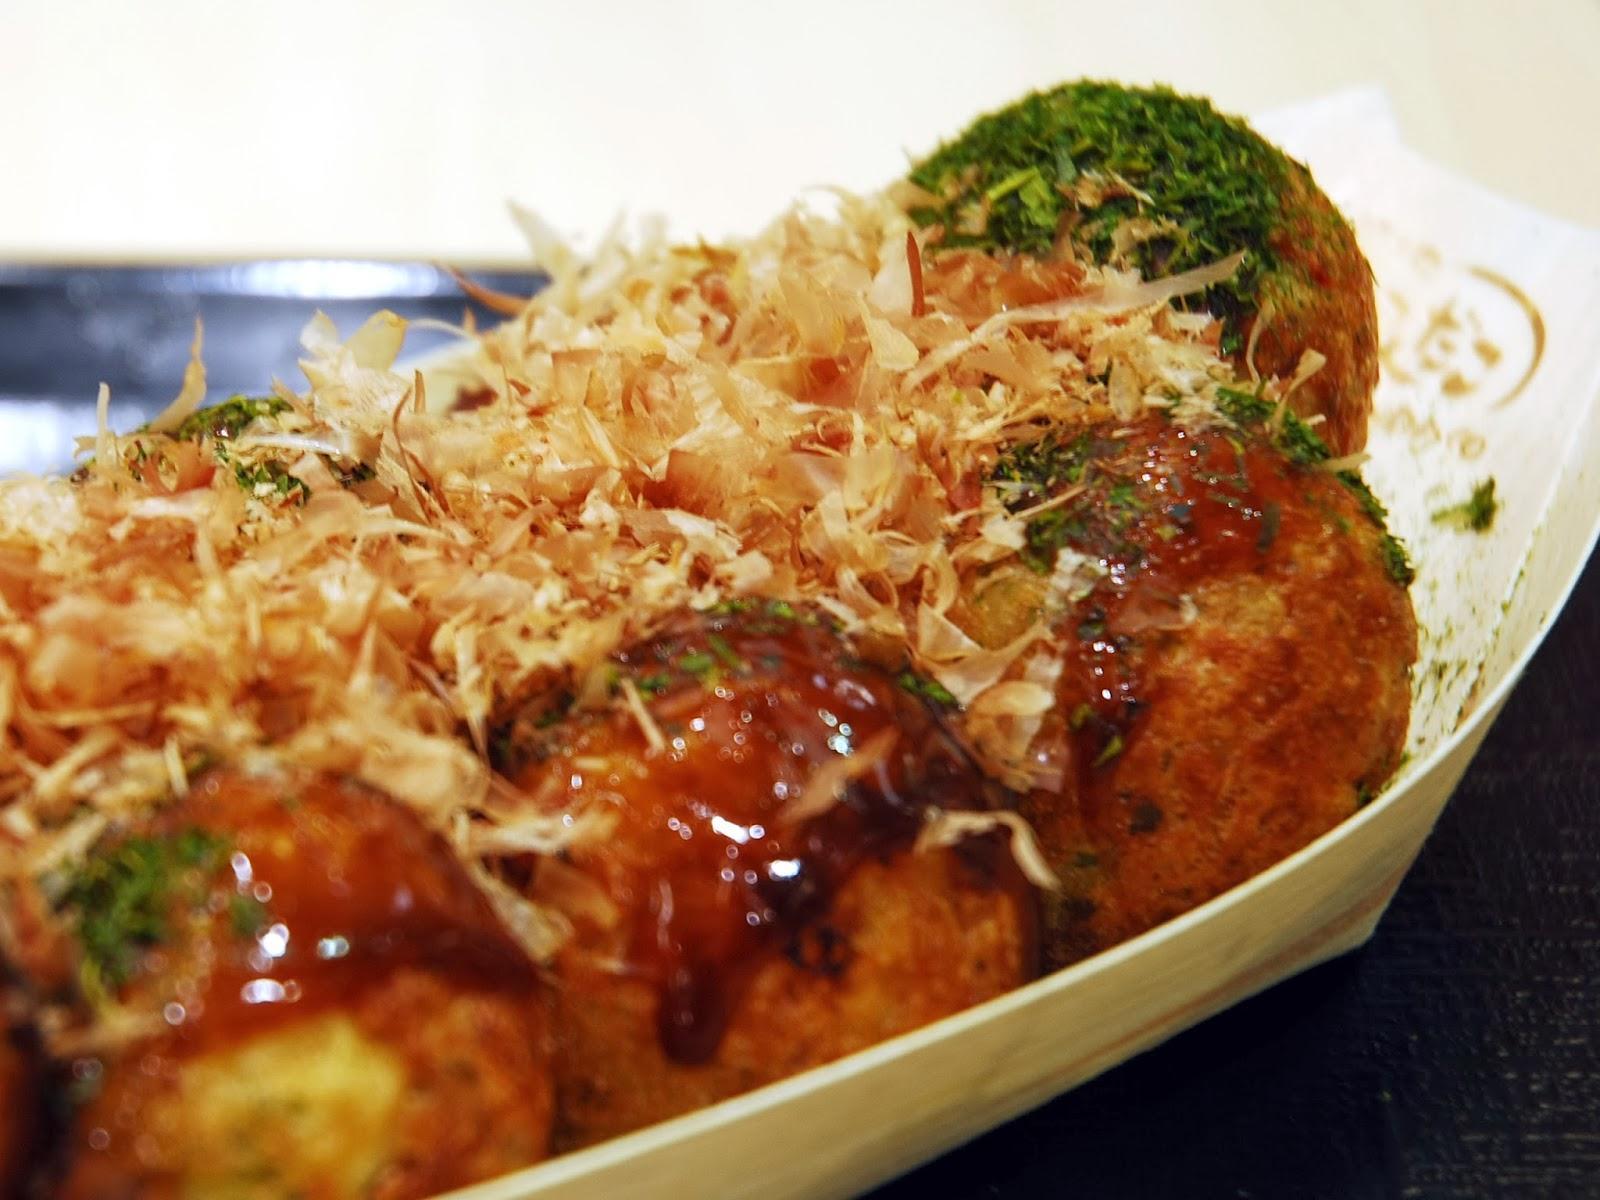 Resep Membuat Takoyaki Japanese Food Sendiri yang Enak ... 2c889d91a0